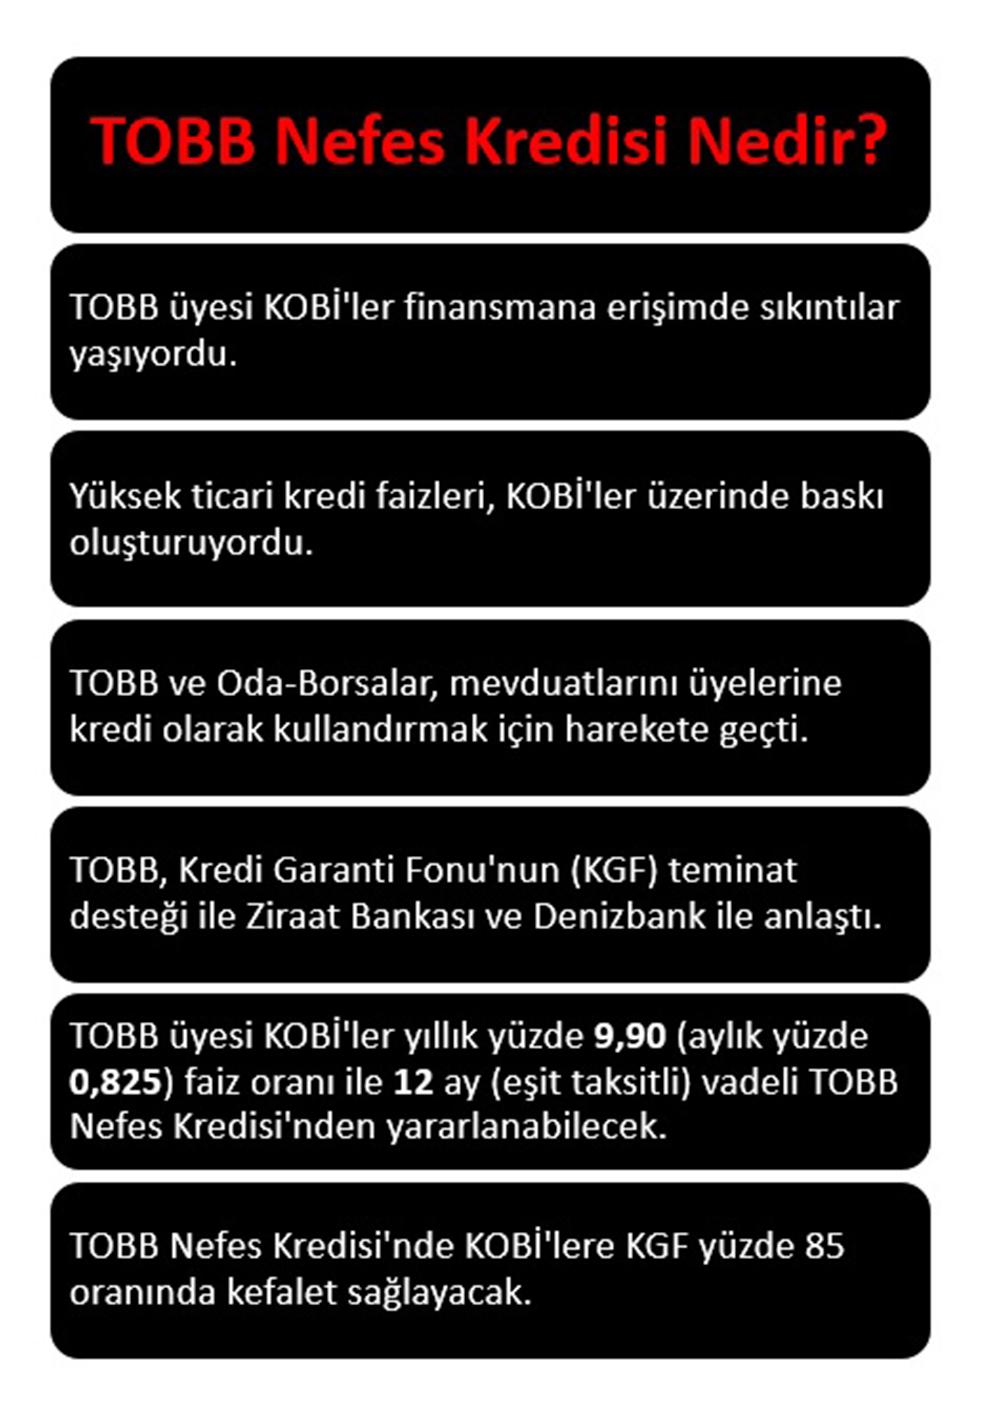 tobb1_1